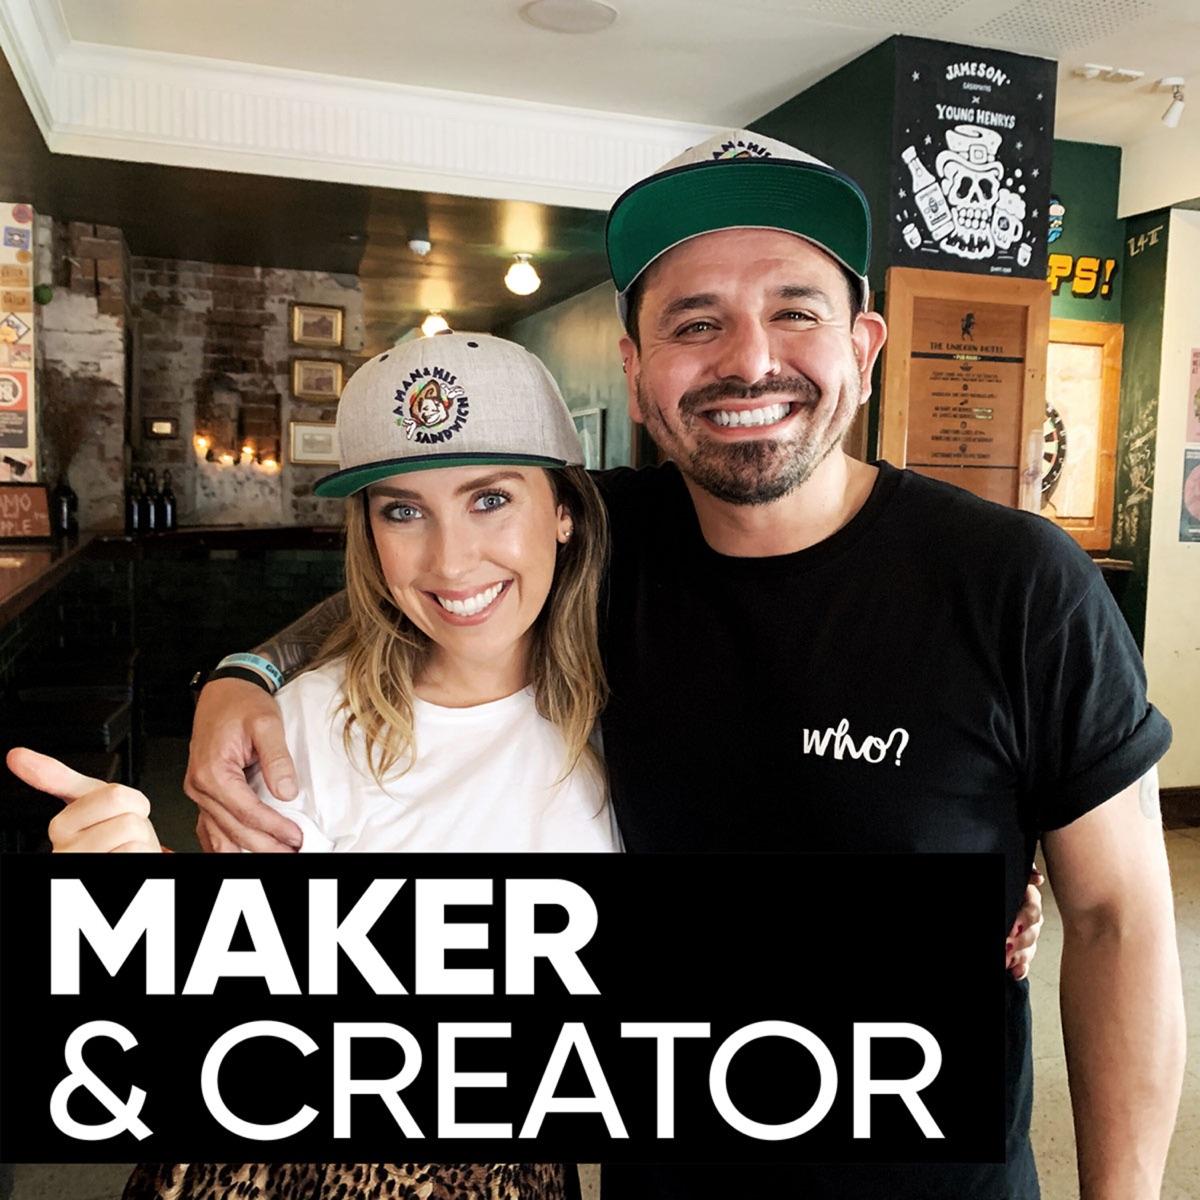 Maker & Creator